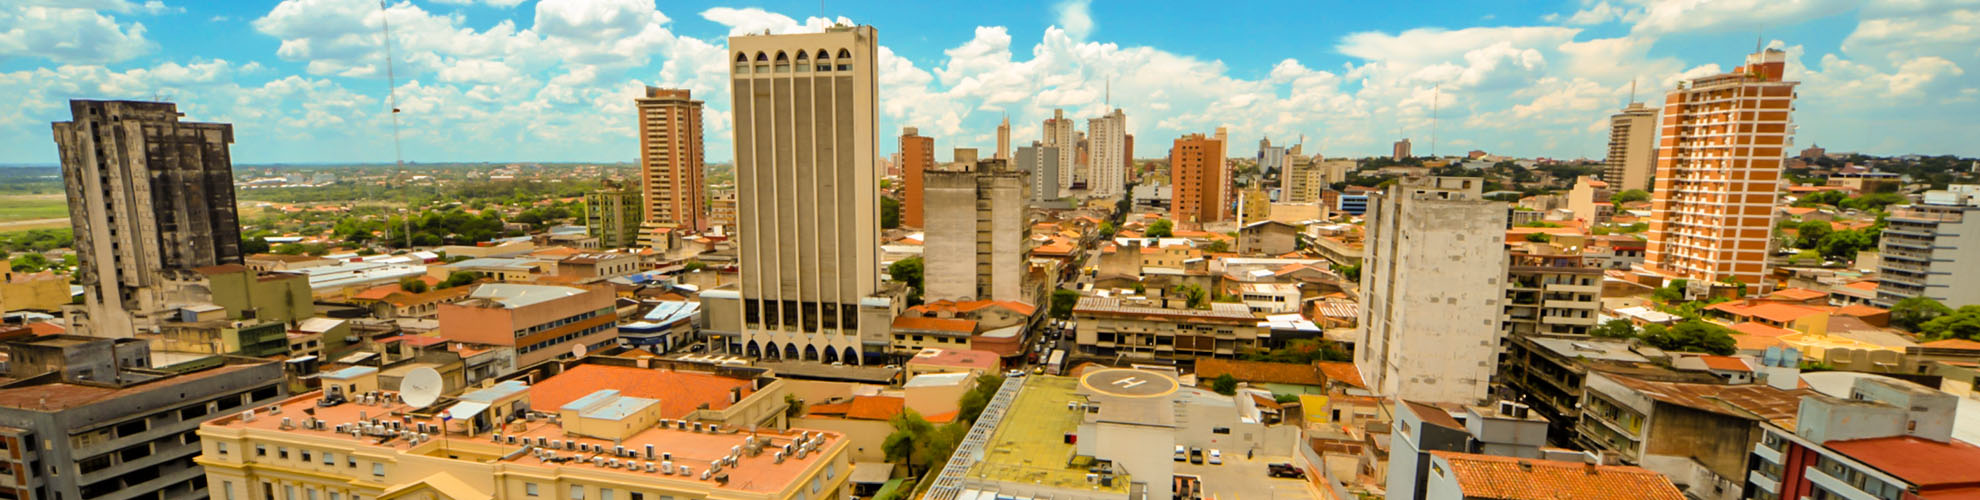 Paraguay Kort Kort Paraguay Peru Sydamerika Nordamerika